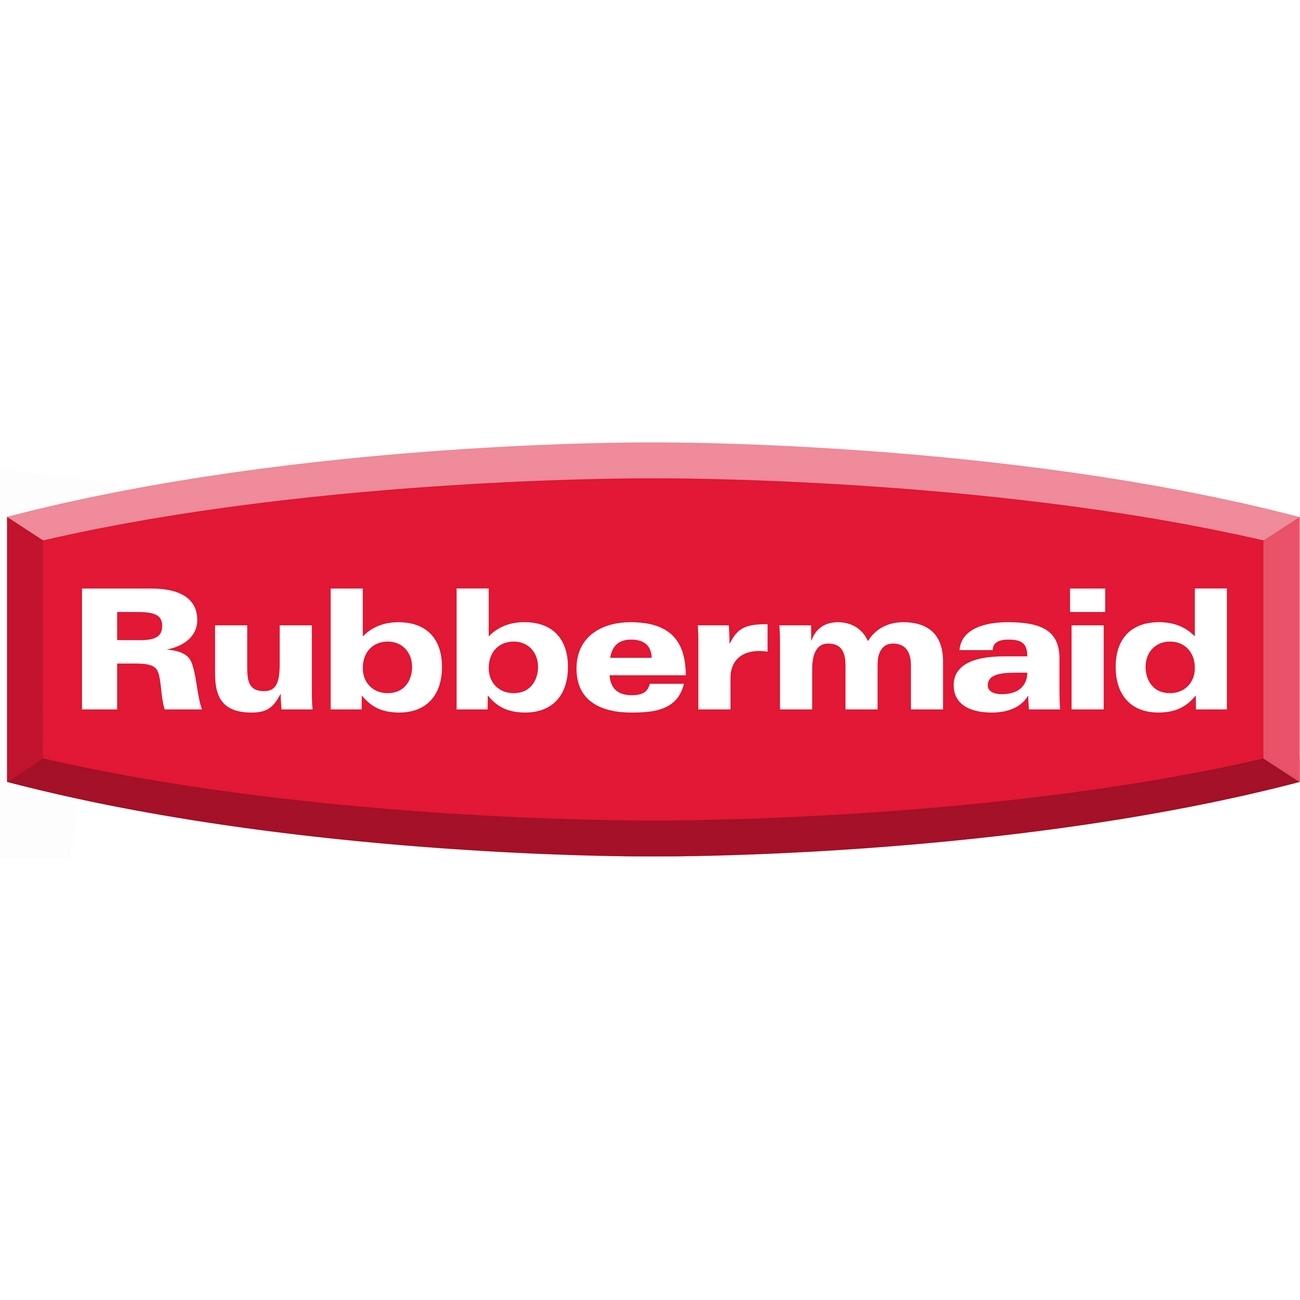 Rubbermaid-758088-YEL-WaveBrake-Mopping-System.jpg